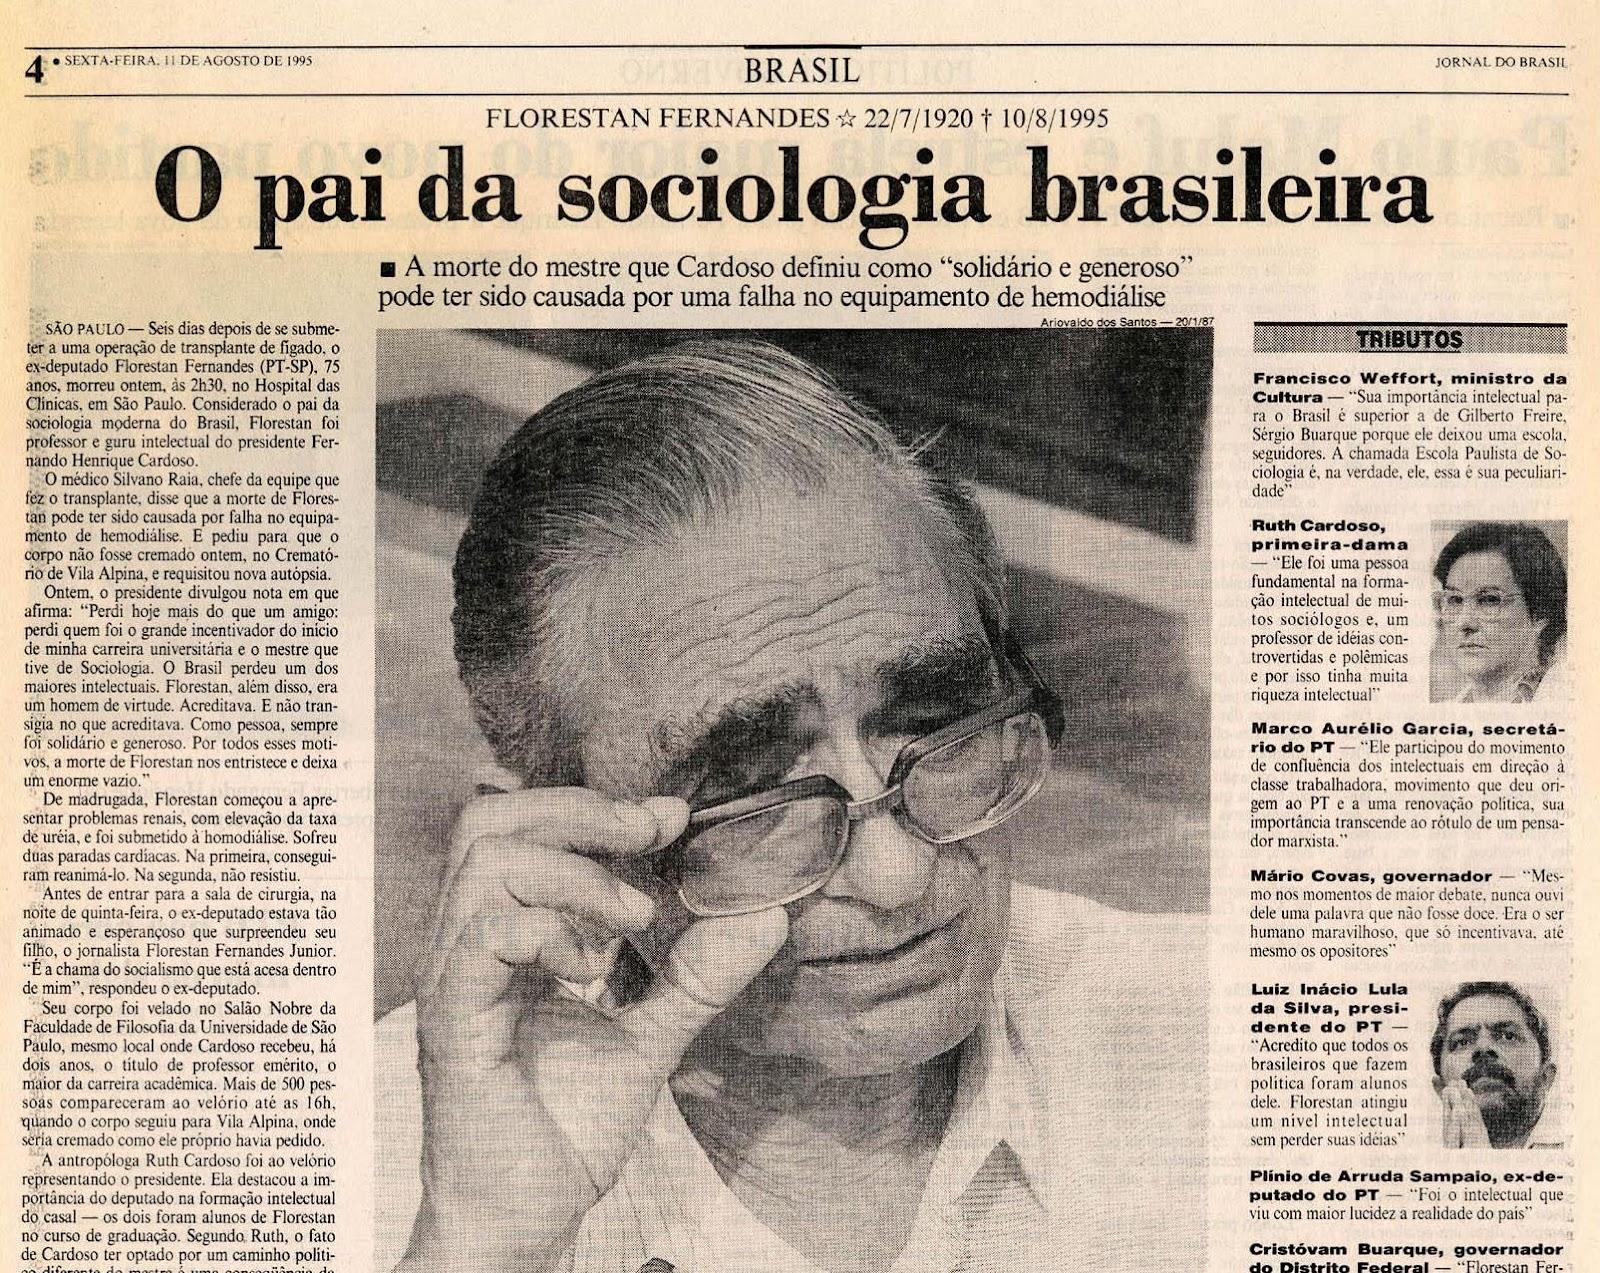 Jornal do Brasil, 11 de Agosto de 1995